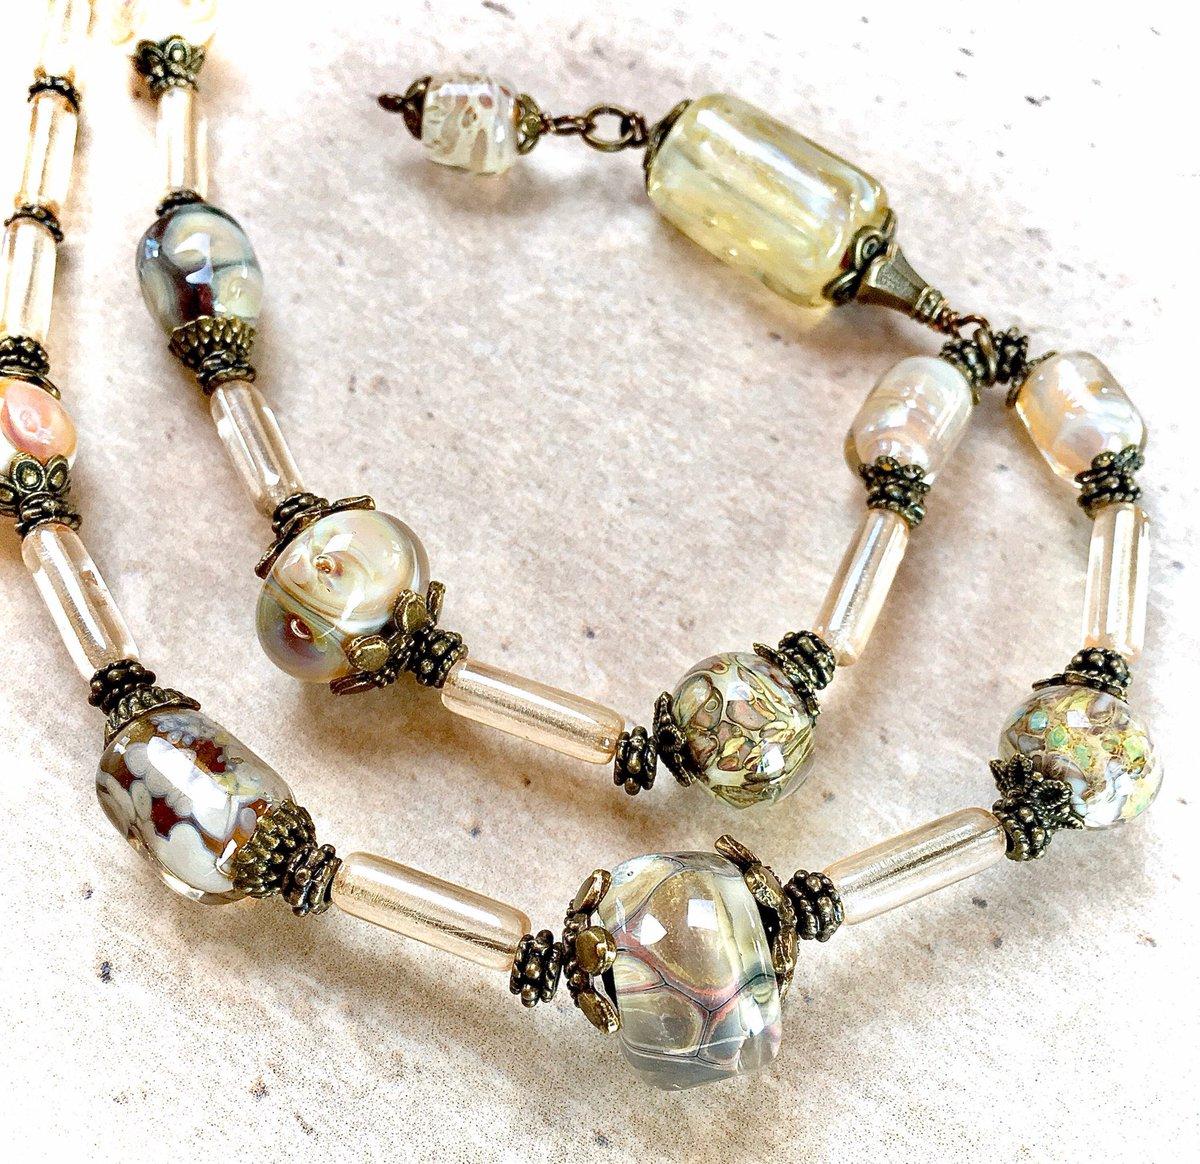 I love making Iridescent Pendant Lampwork necklace #jewelry #necklace #lampwork #handmade #lampworkbead